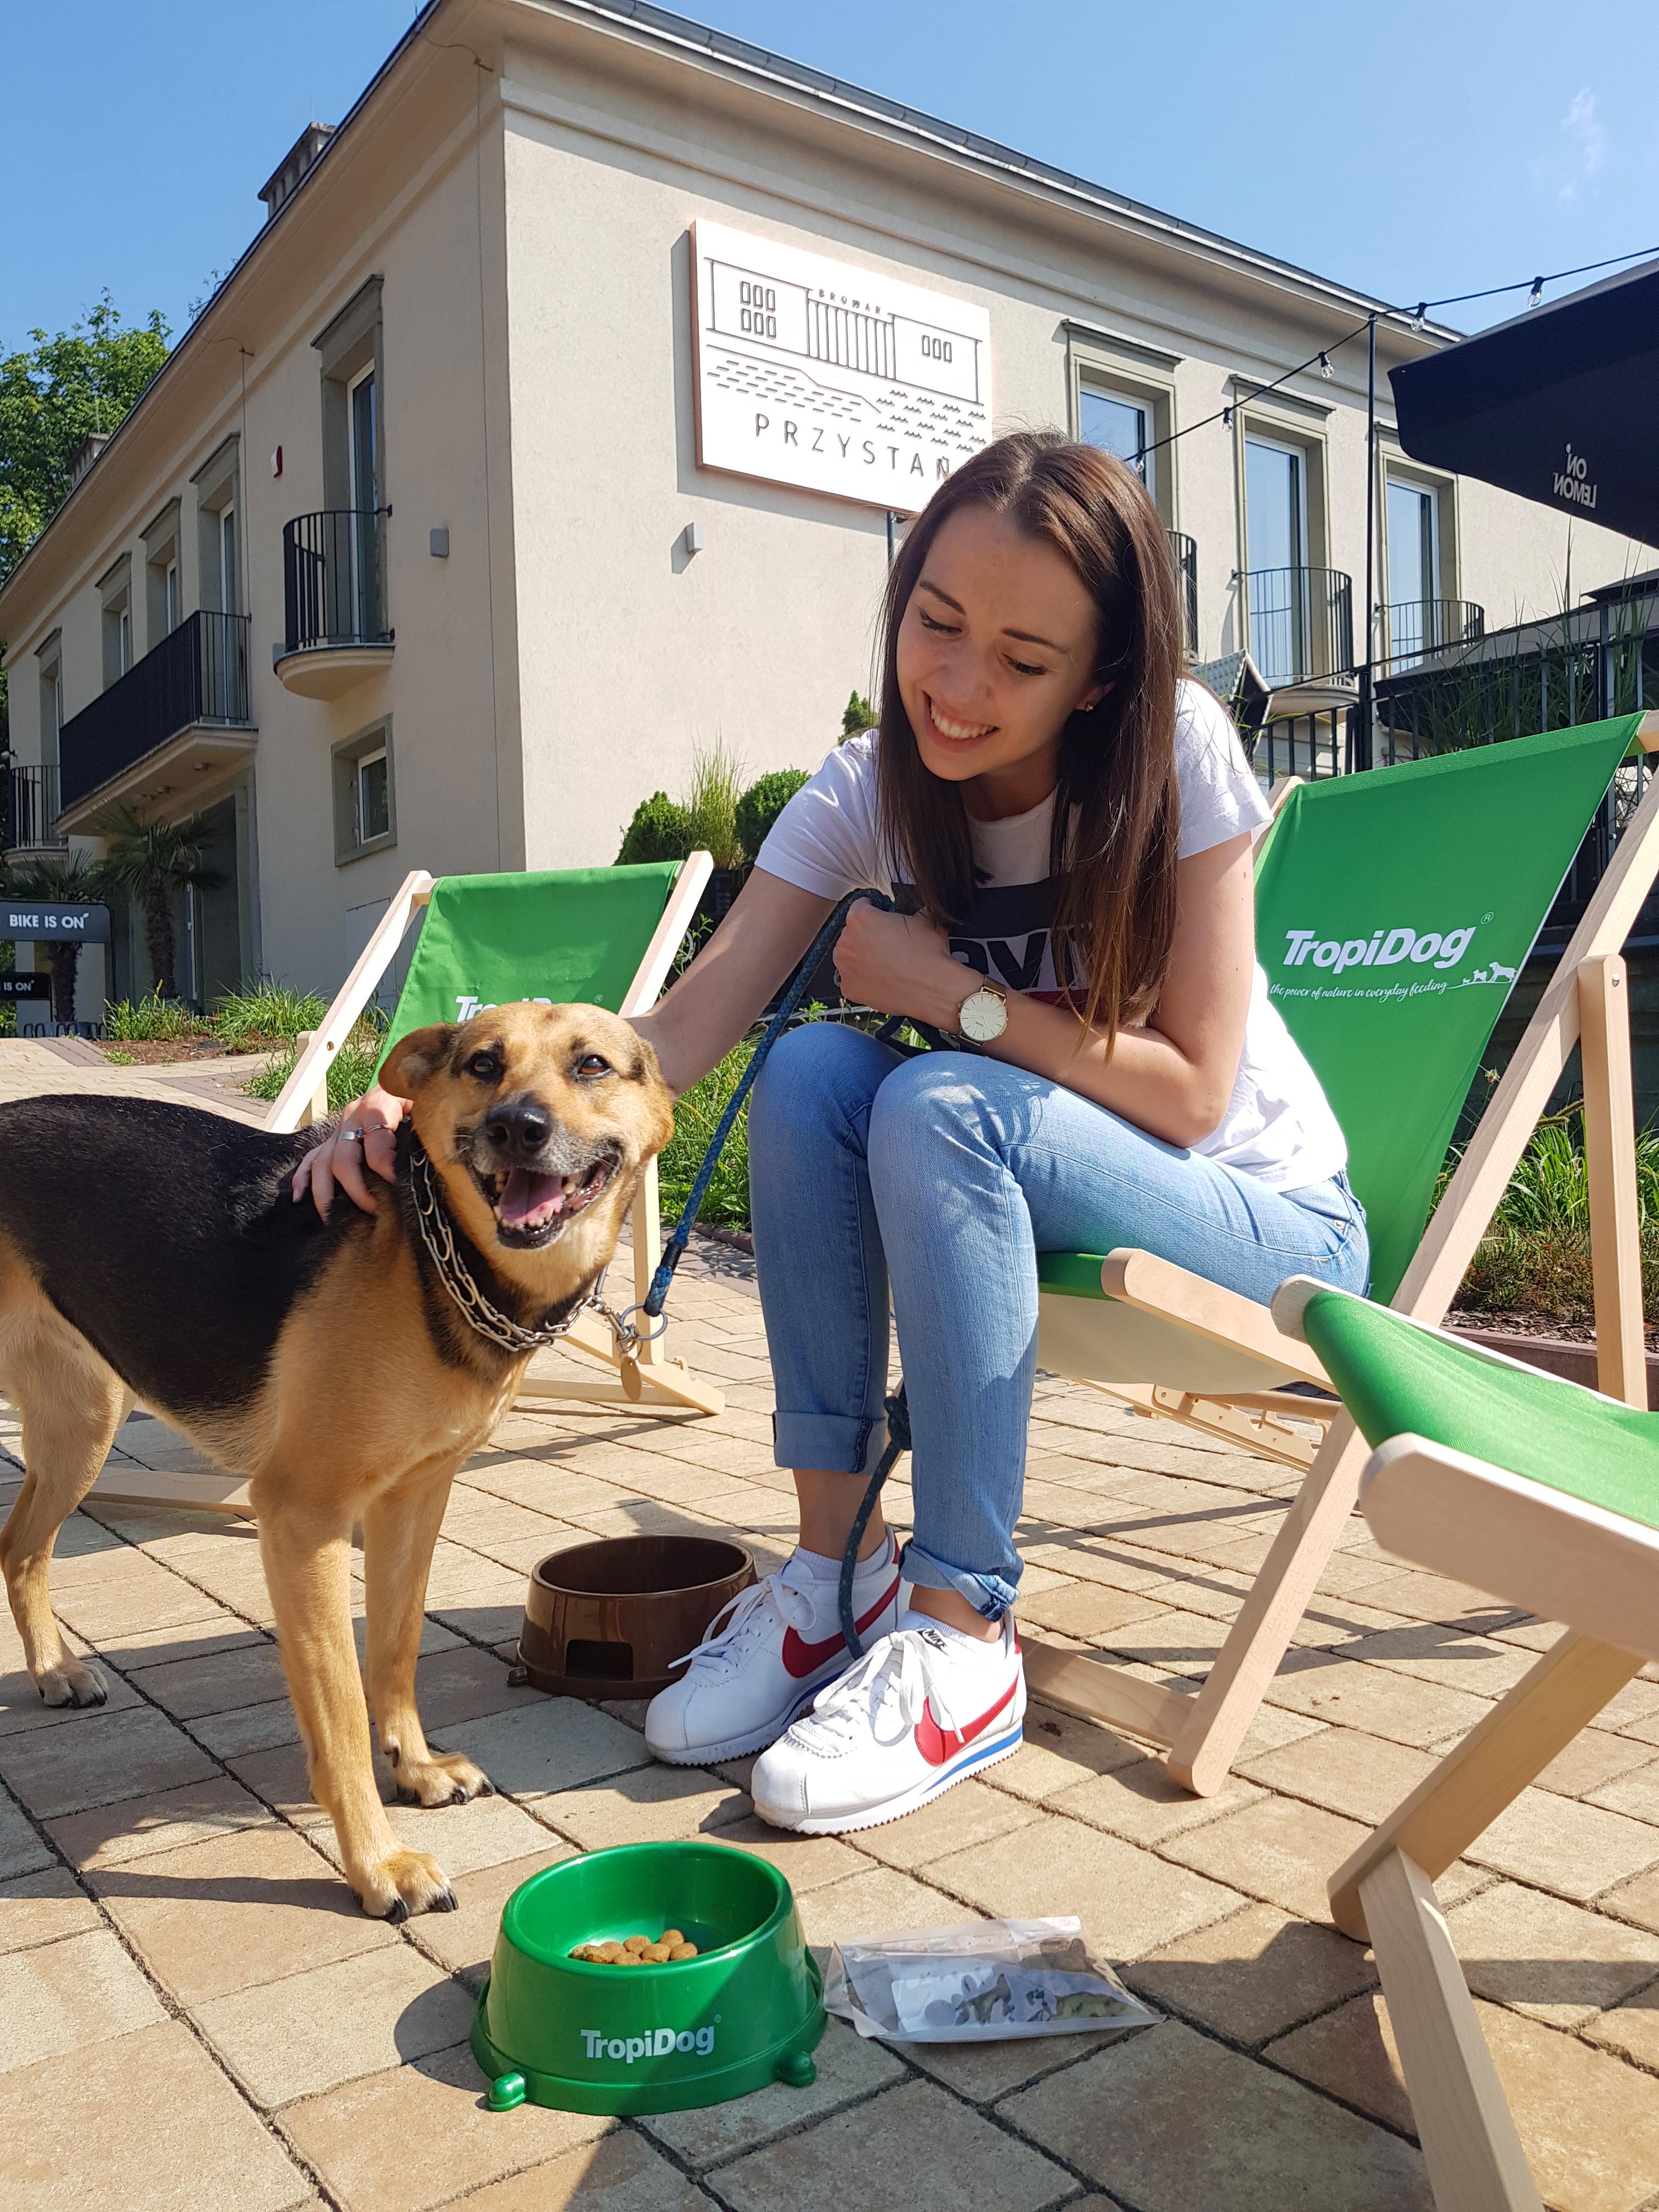 Strefa relaksu i menu dla psów od TropiDog